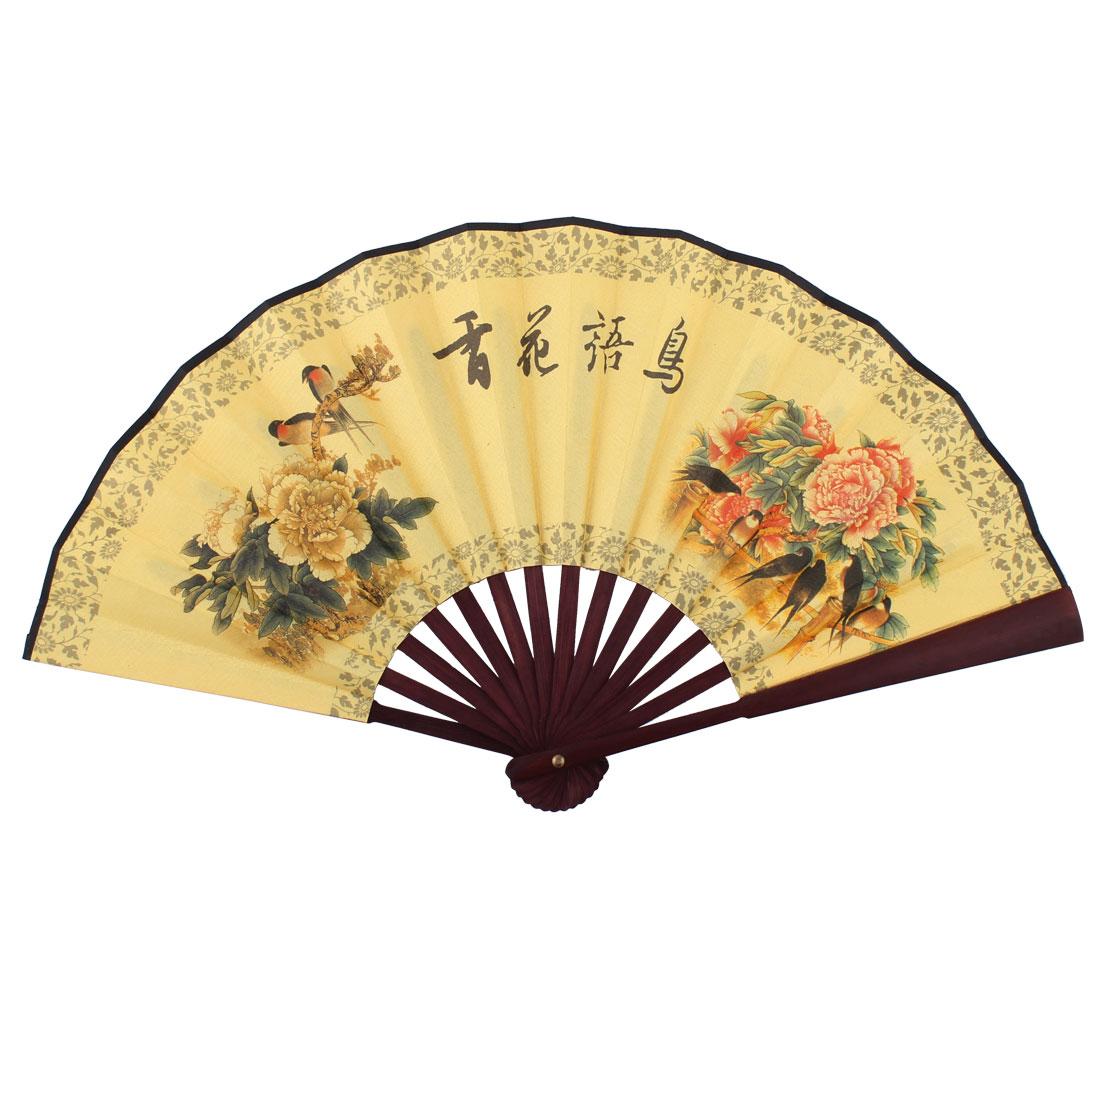 Wood Frame Peony Bird Pattern Chinese Character Retro Folding Handheld Fan